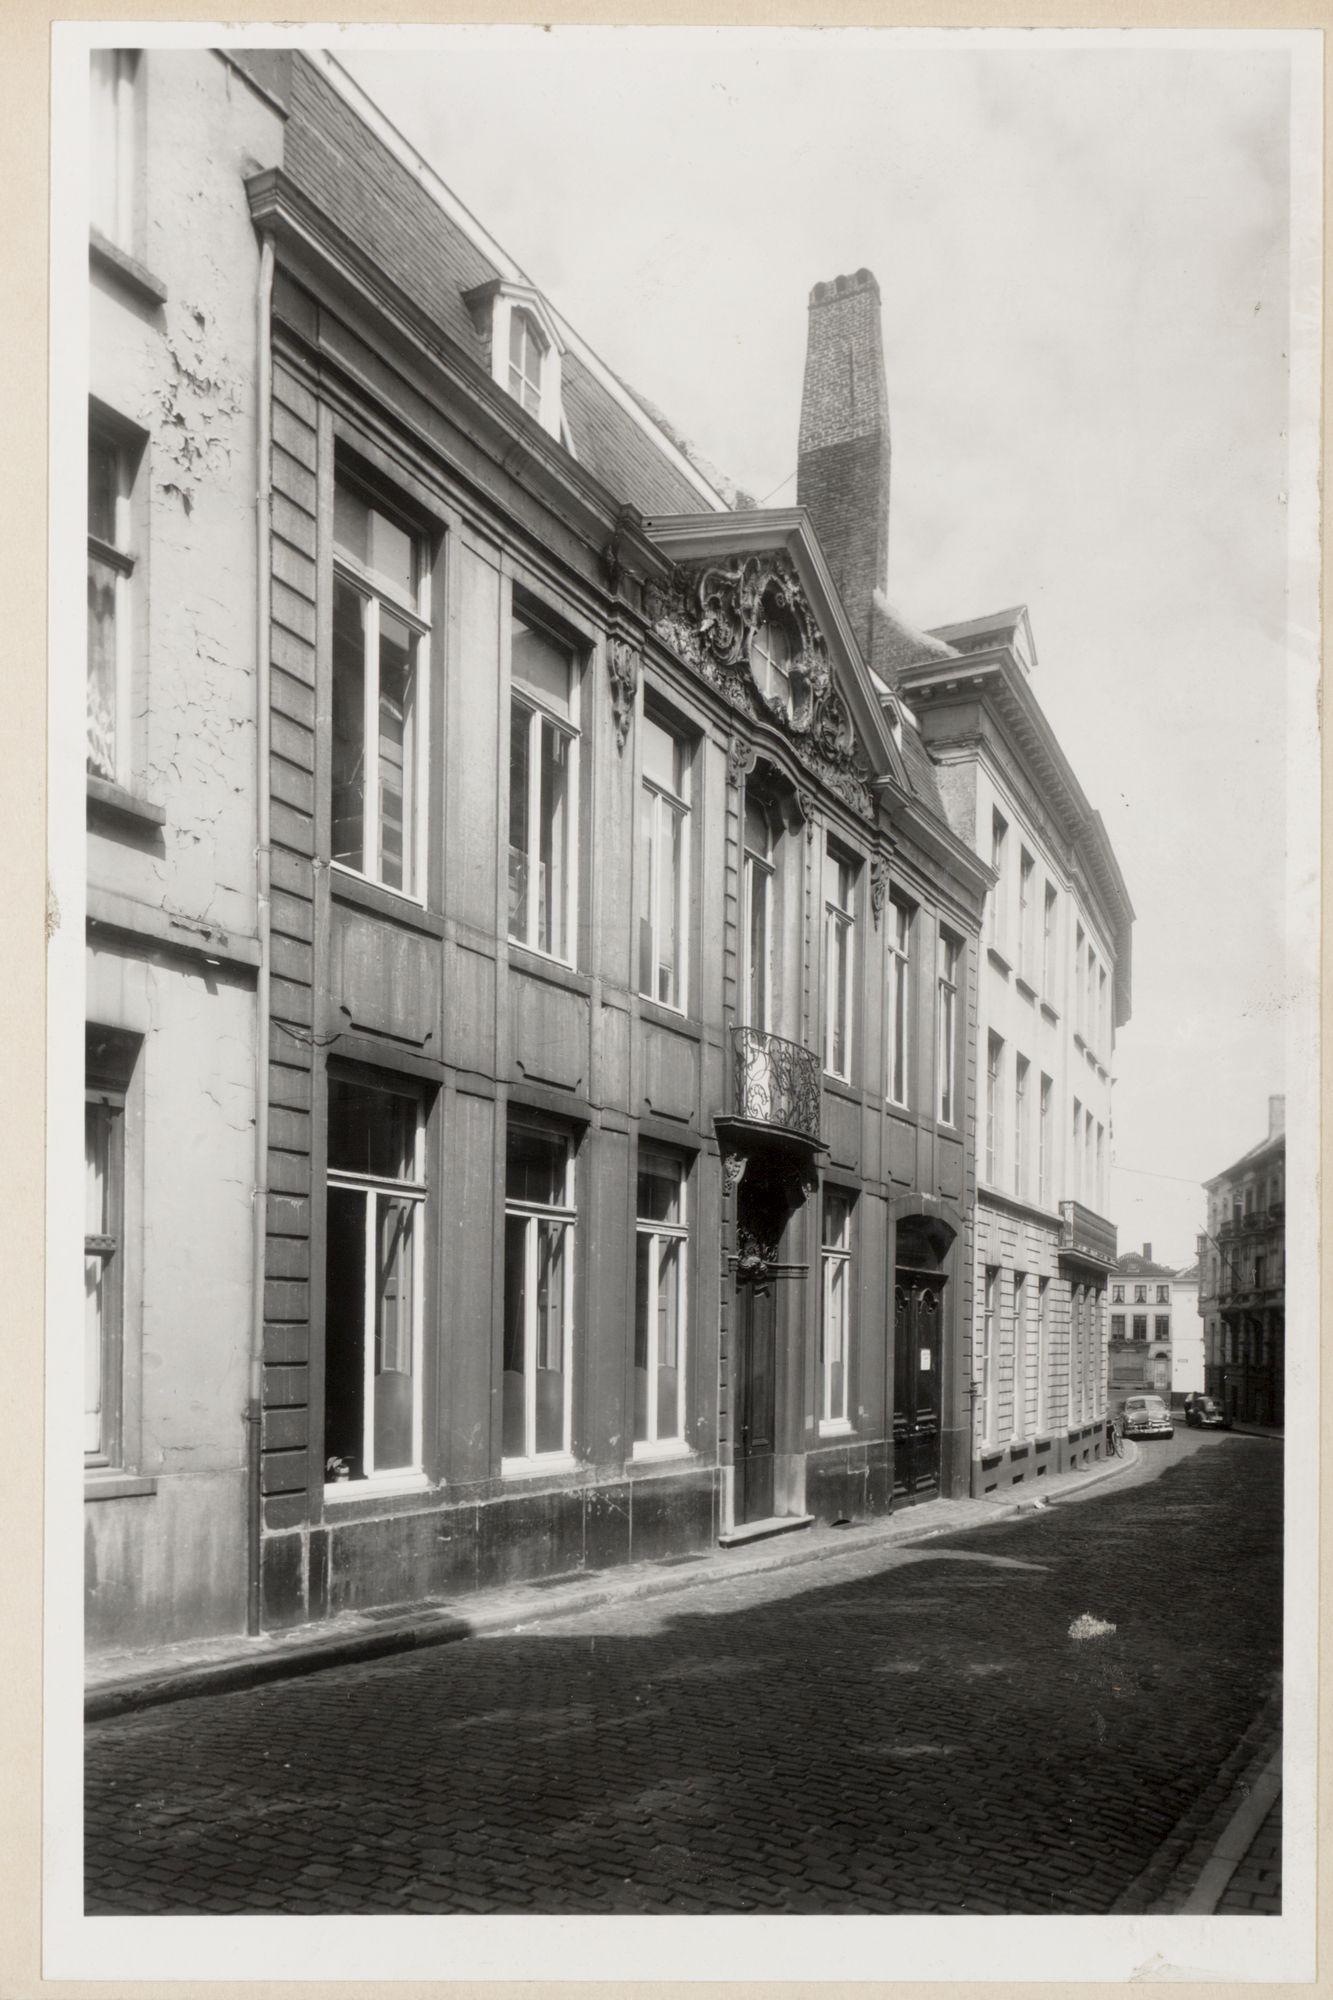 Gent: Hotel Louis XV of Huis Flandria, Kwaadham 7